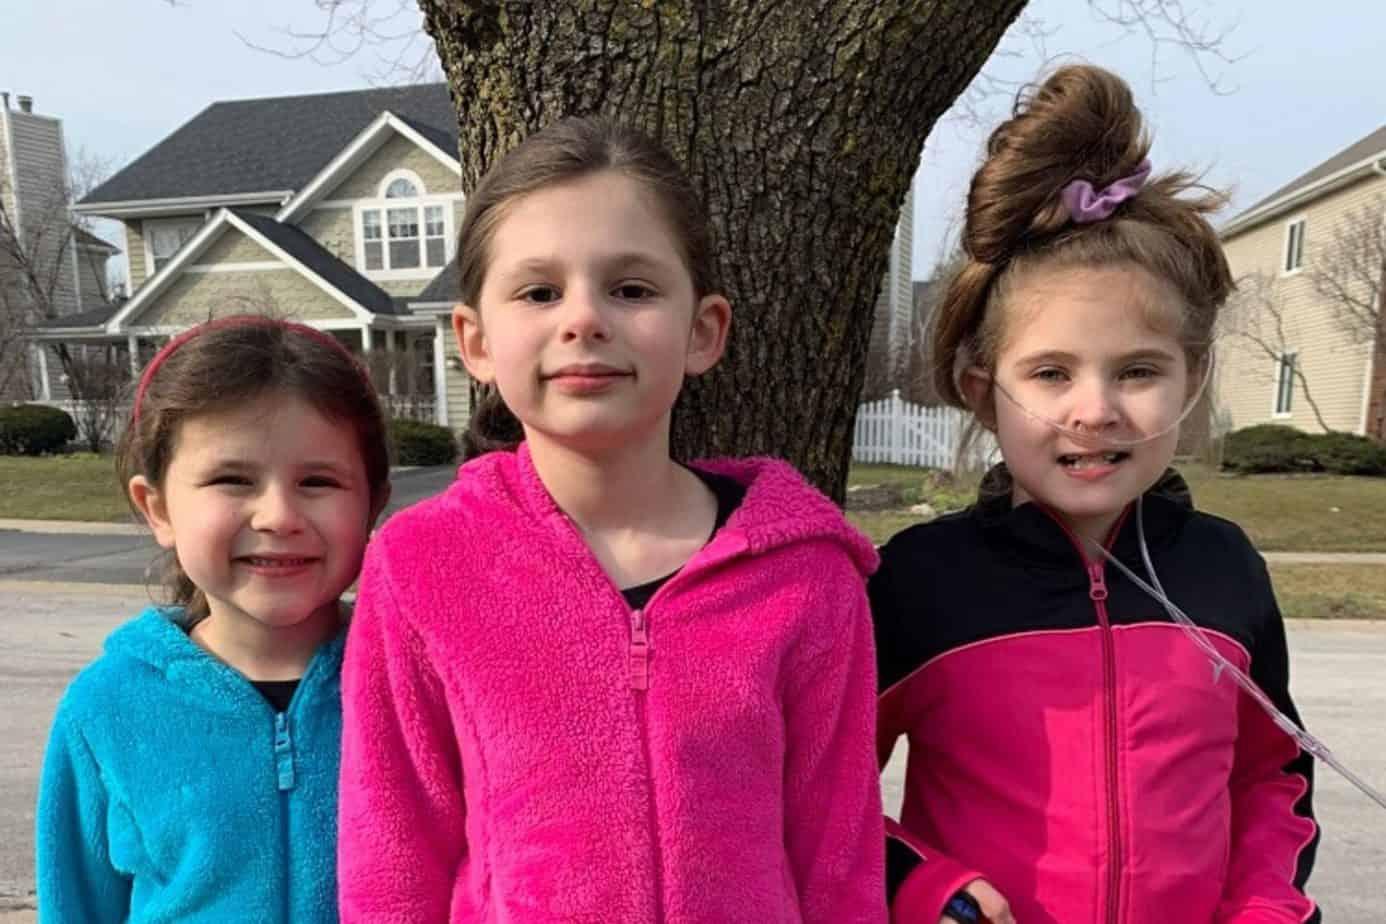 daughters doing neighborhood cleanup